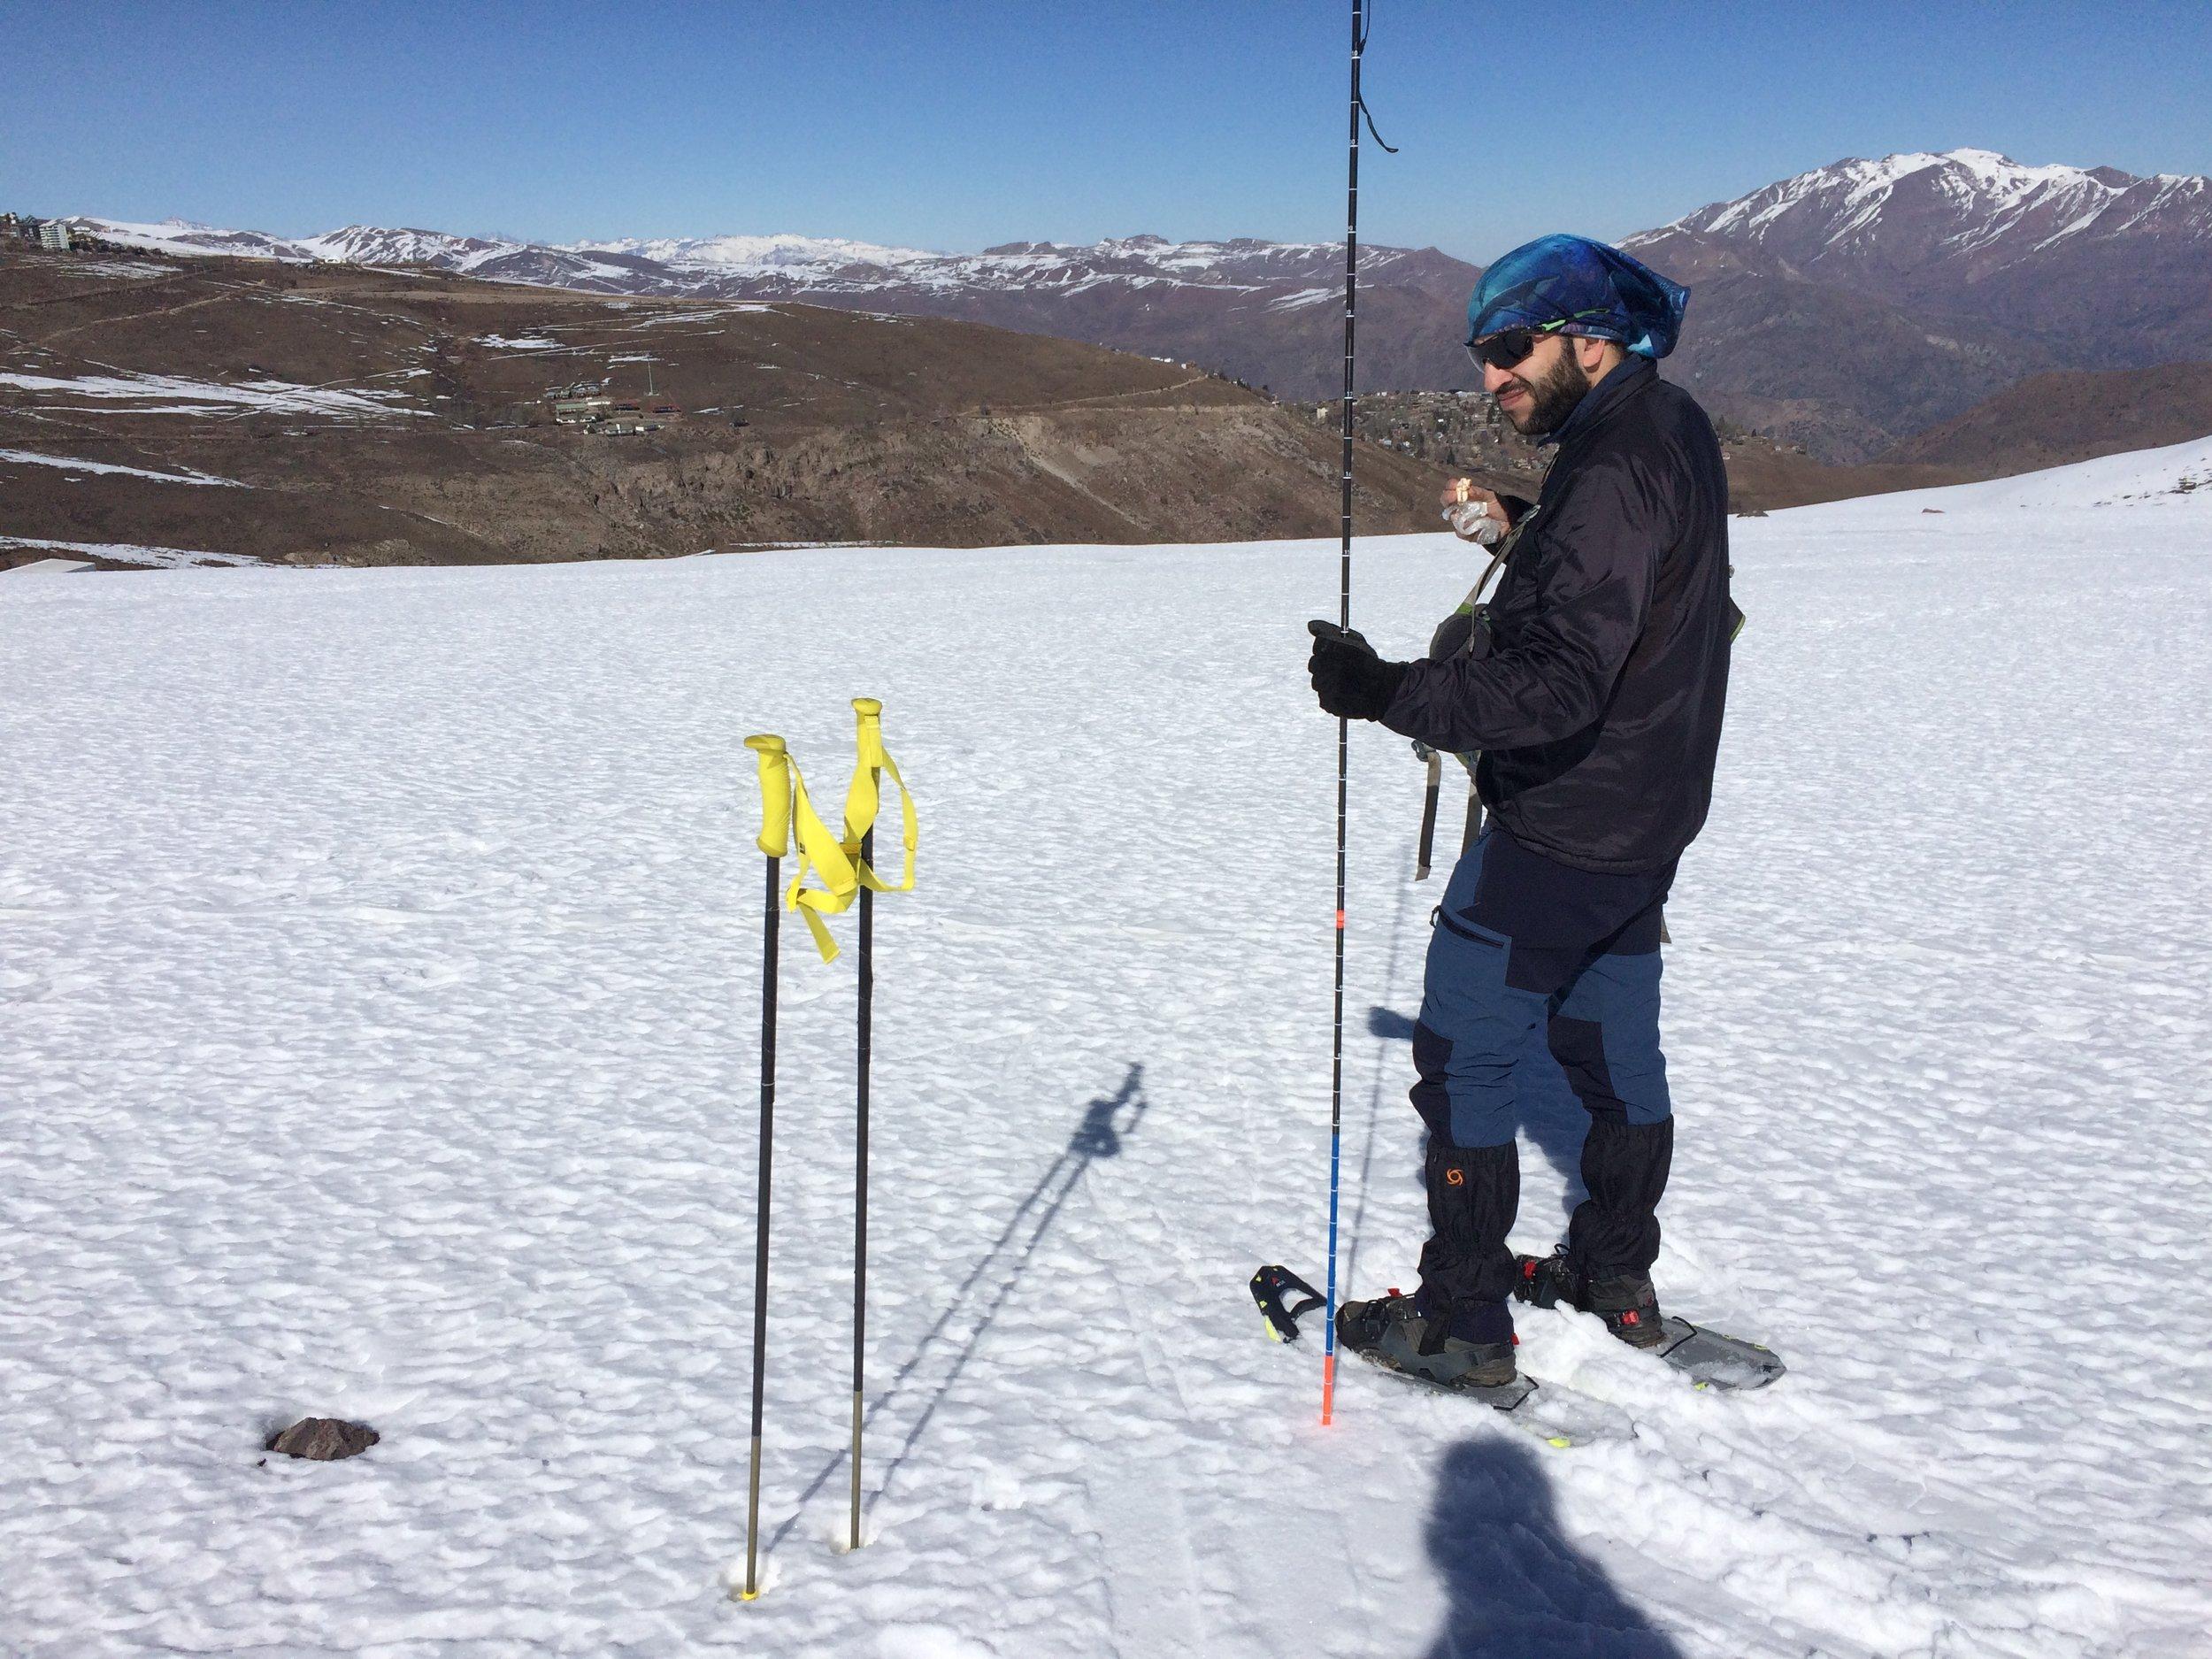 Multitasking: depth measurements, lunch